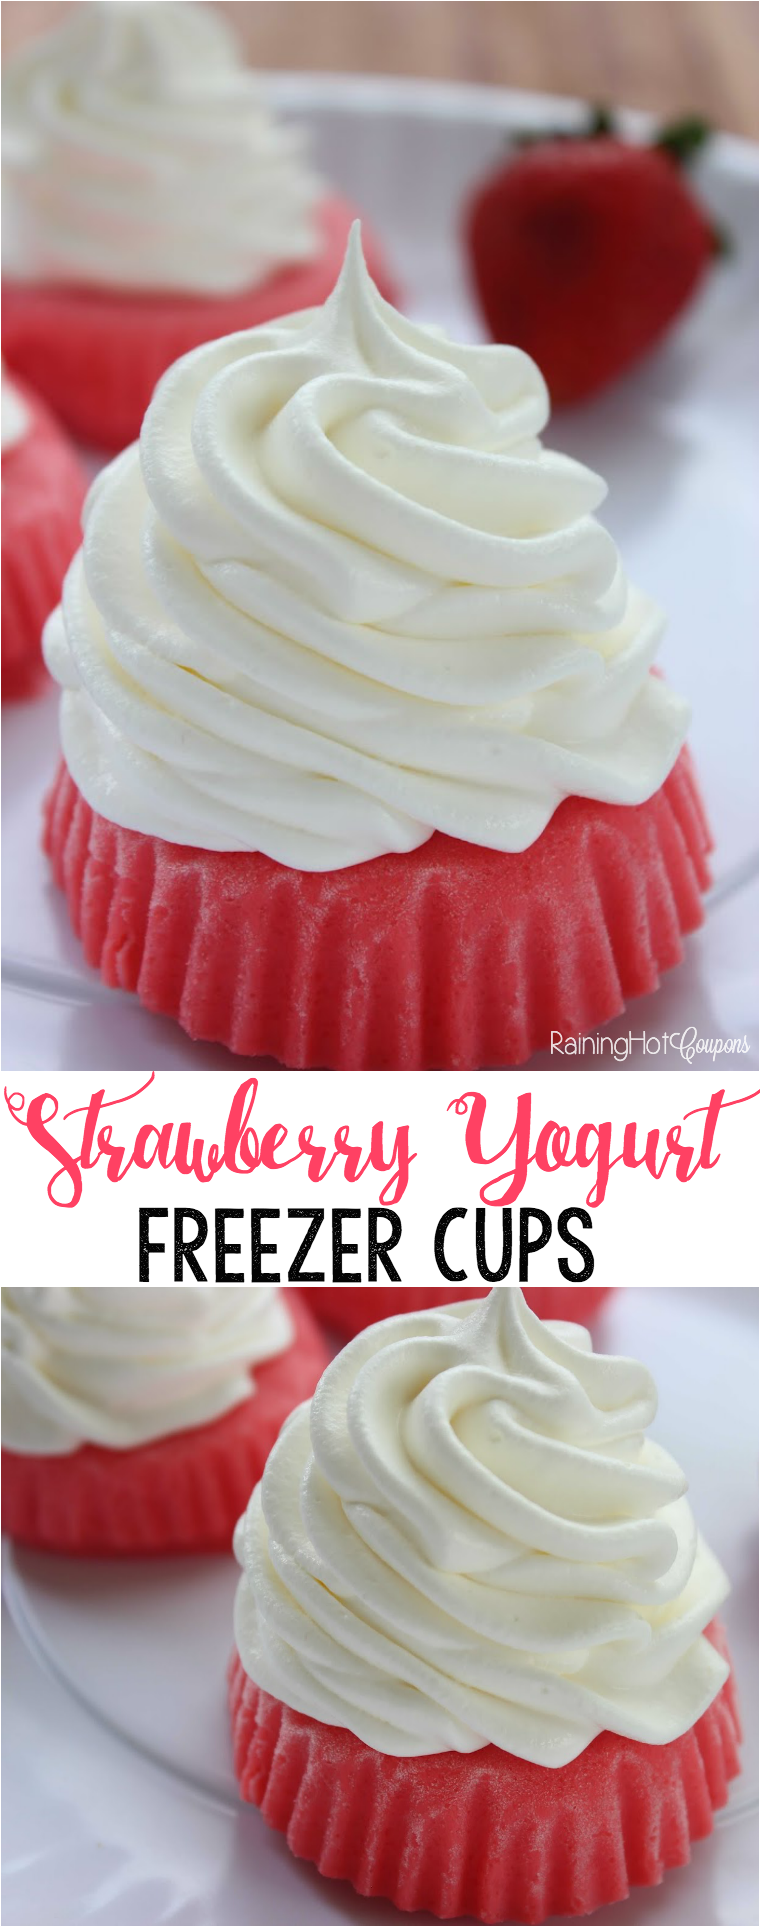 freezer cups